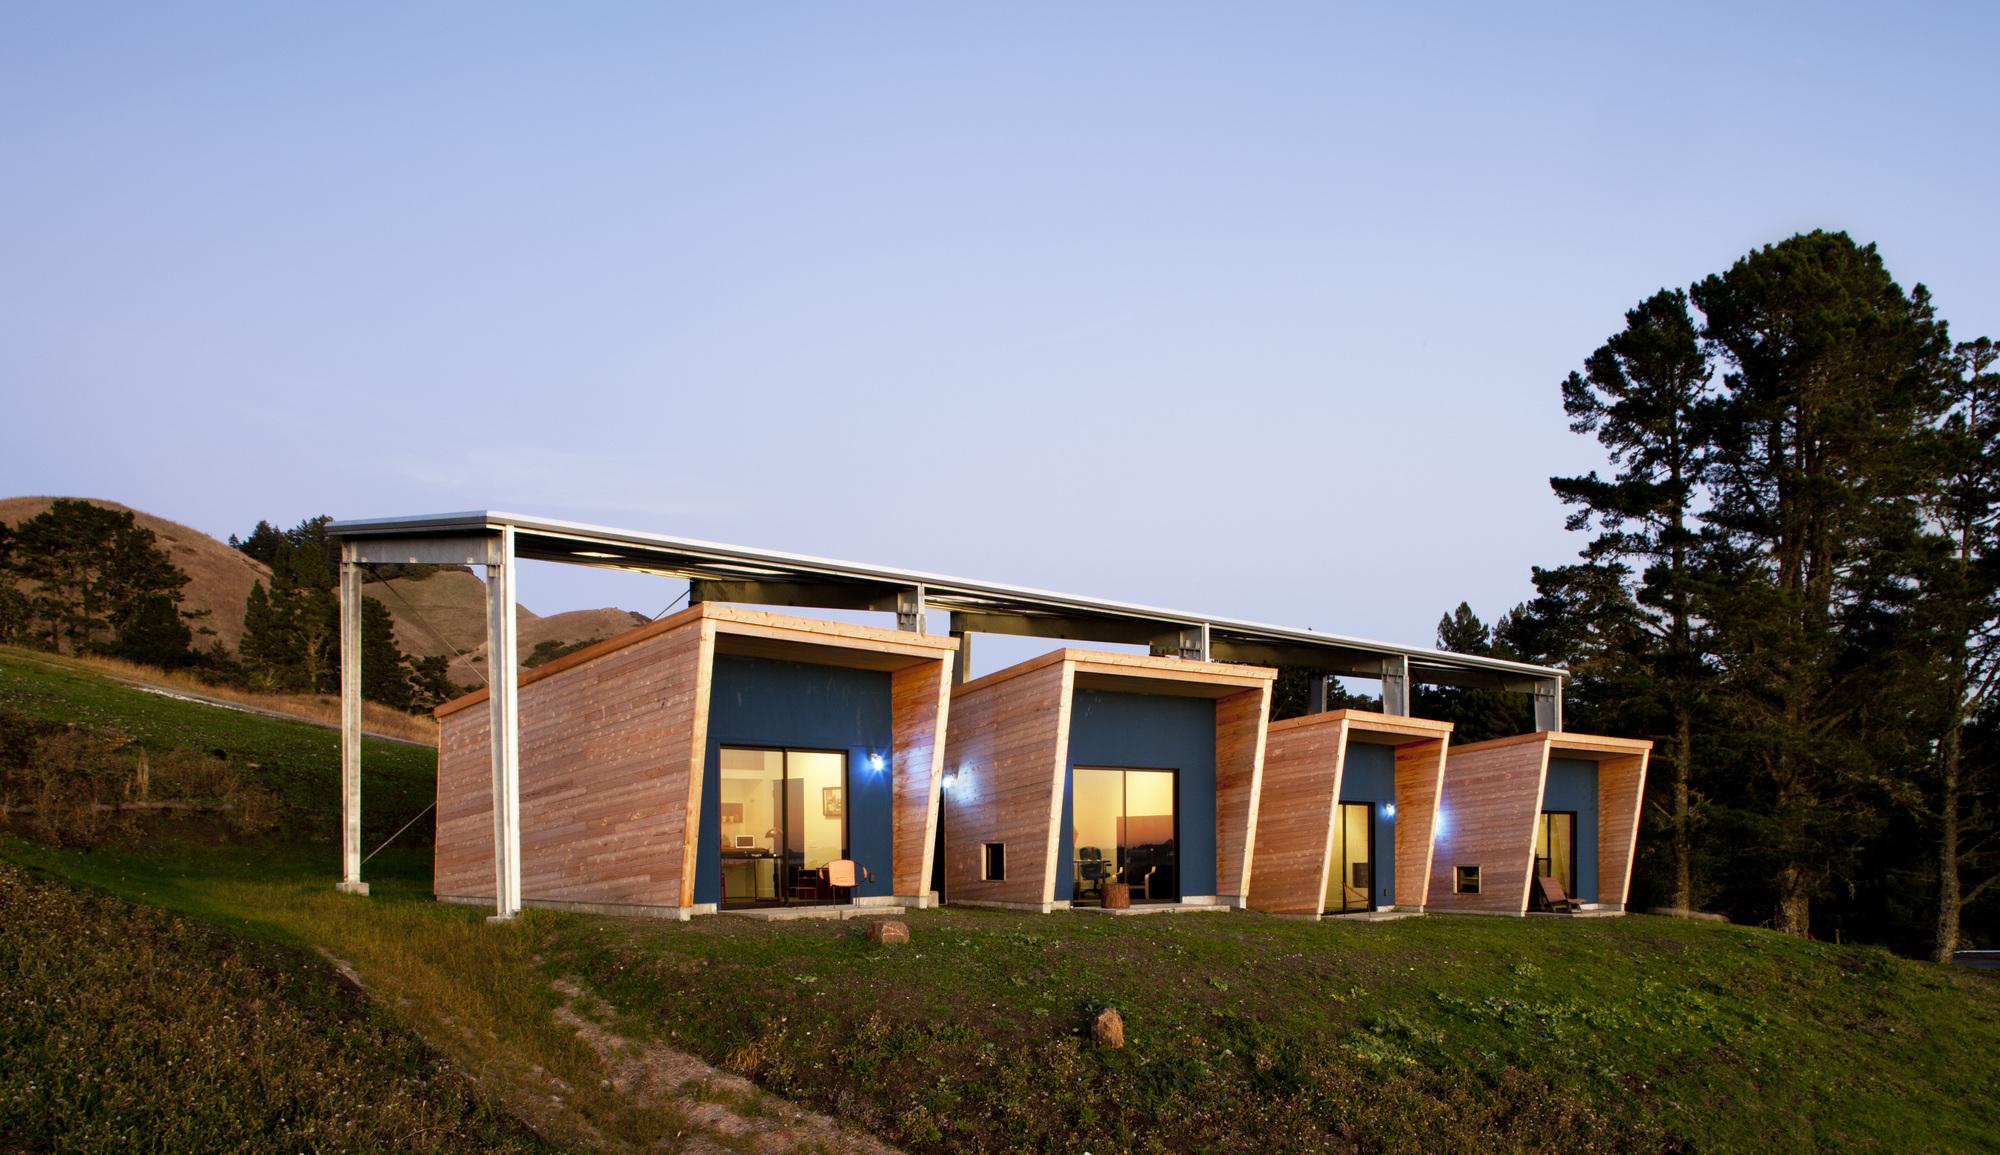 Diane Middlebrook Memorial Building / CCS Architecture, © Cortesia de CCS Architecture